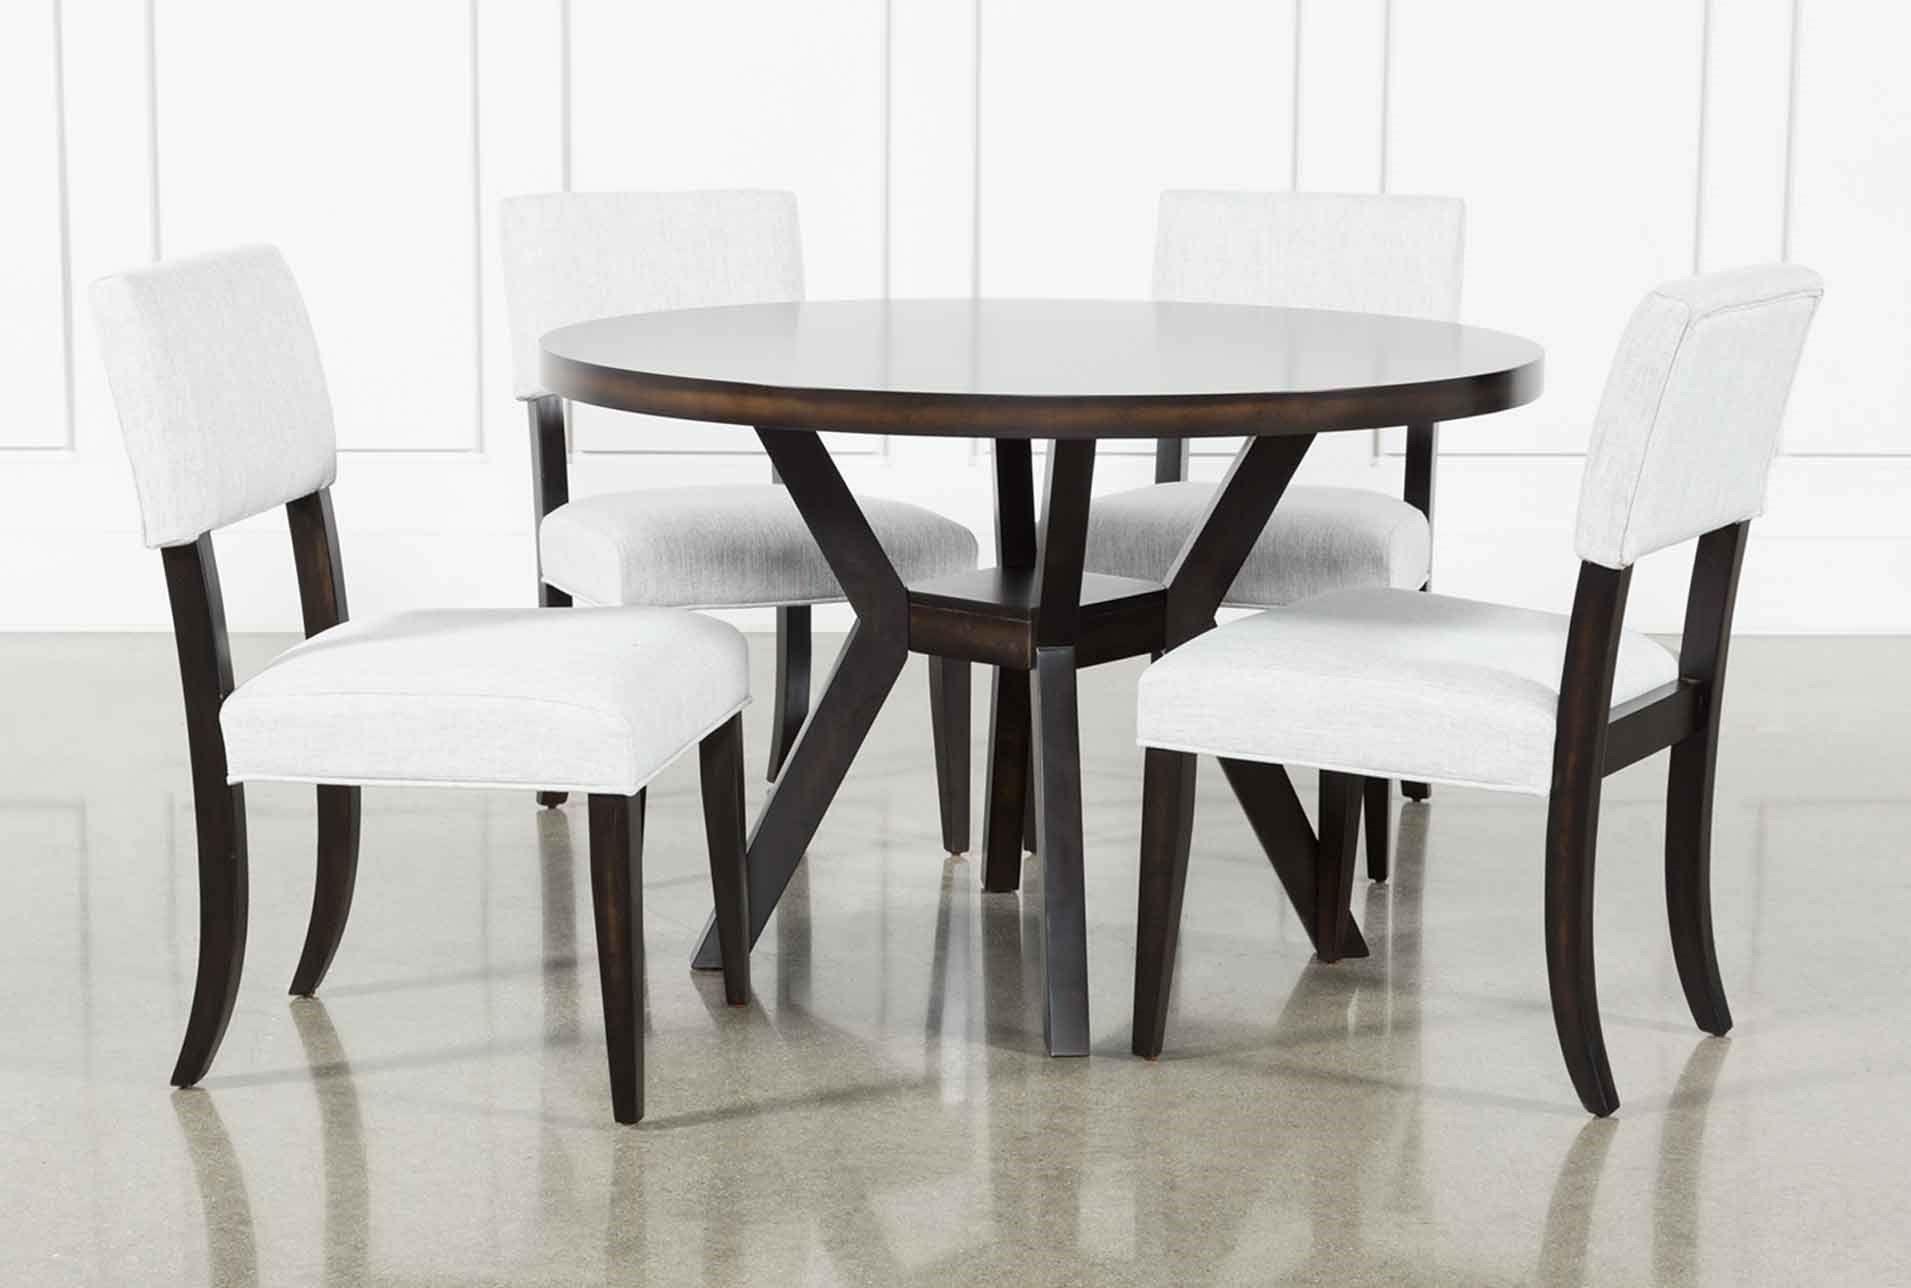 Macie Black 5 Piece Dining Set 540 Dining Room Inspiration 5